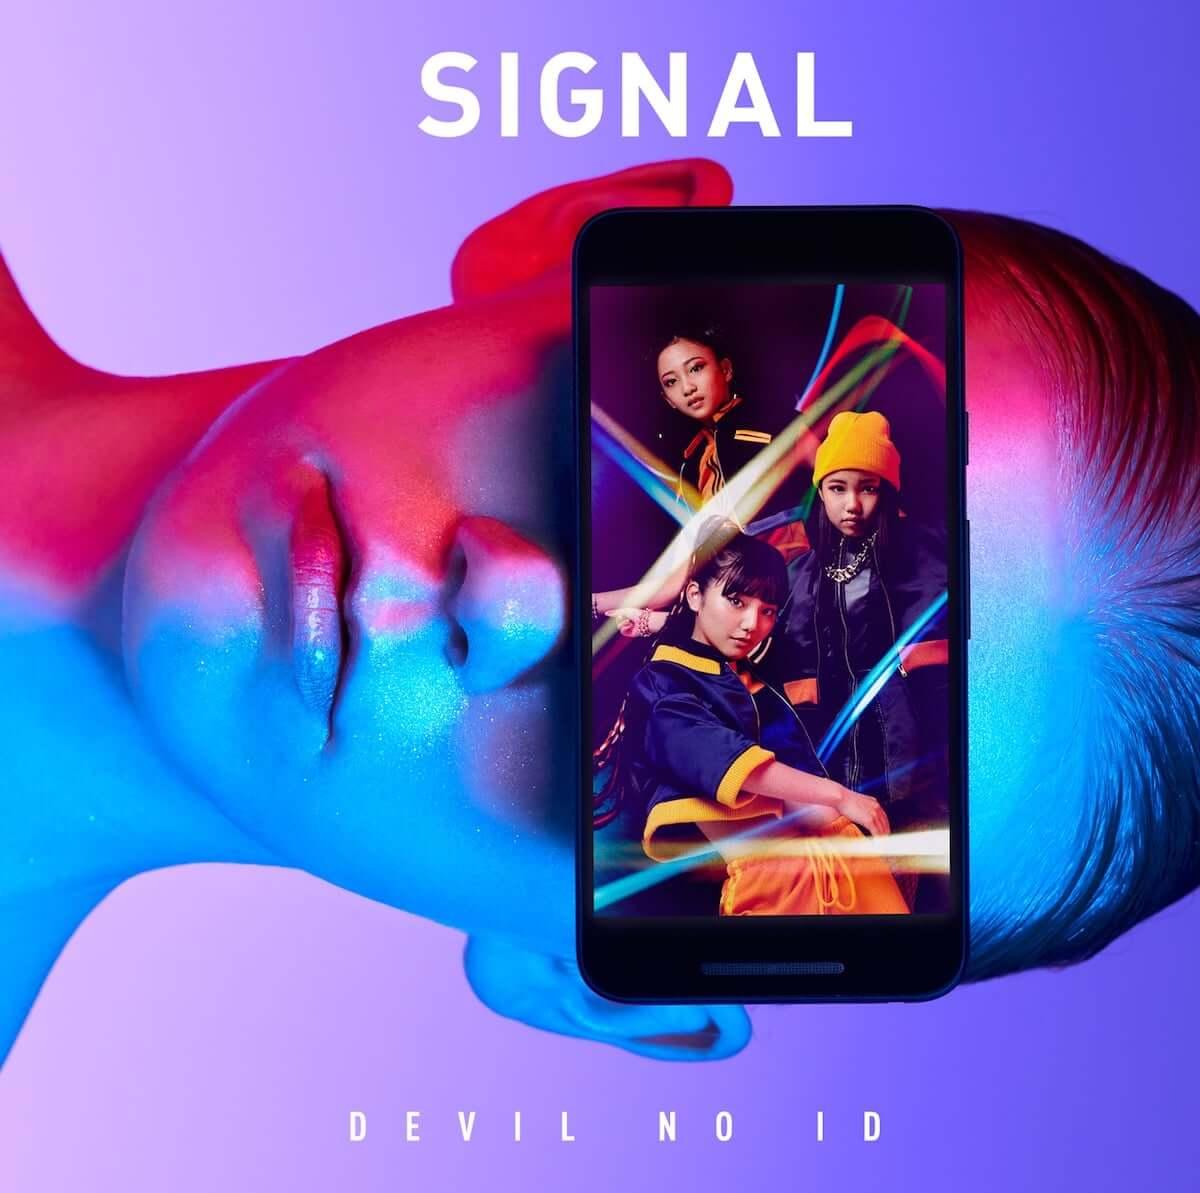 DEVIL NO IDがニューシングルをドロップ|無限大の可能性をめぐり、クリエイティブチームPOPCONEが語る interview_devil-no-id_5-1200x1193